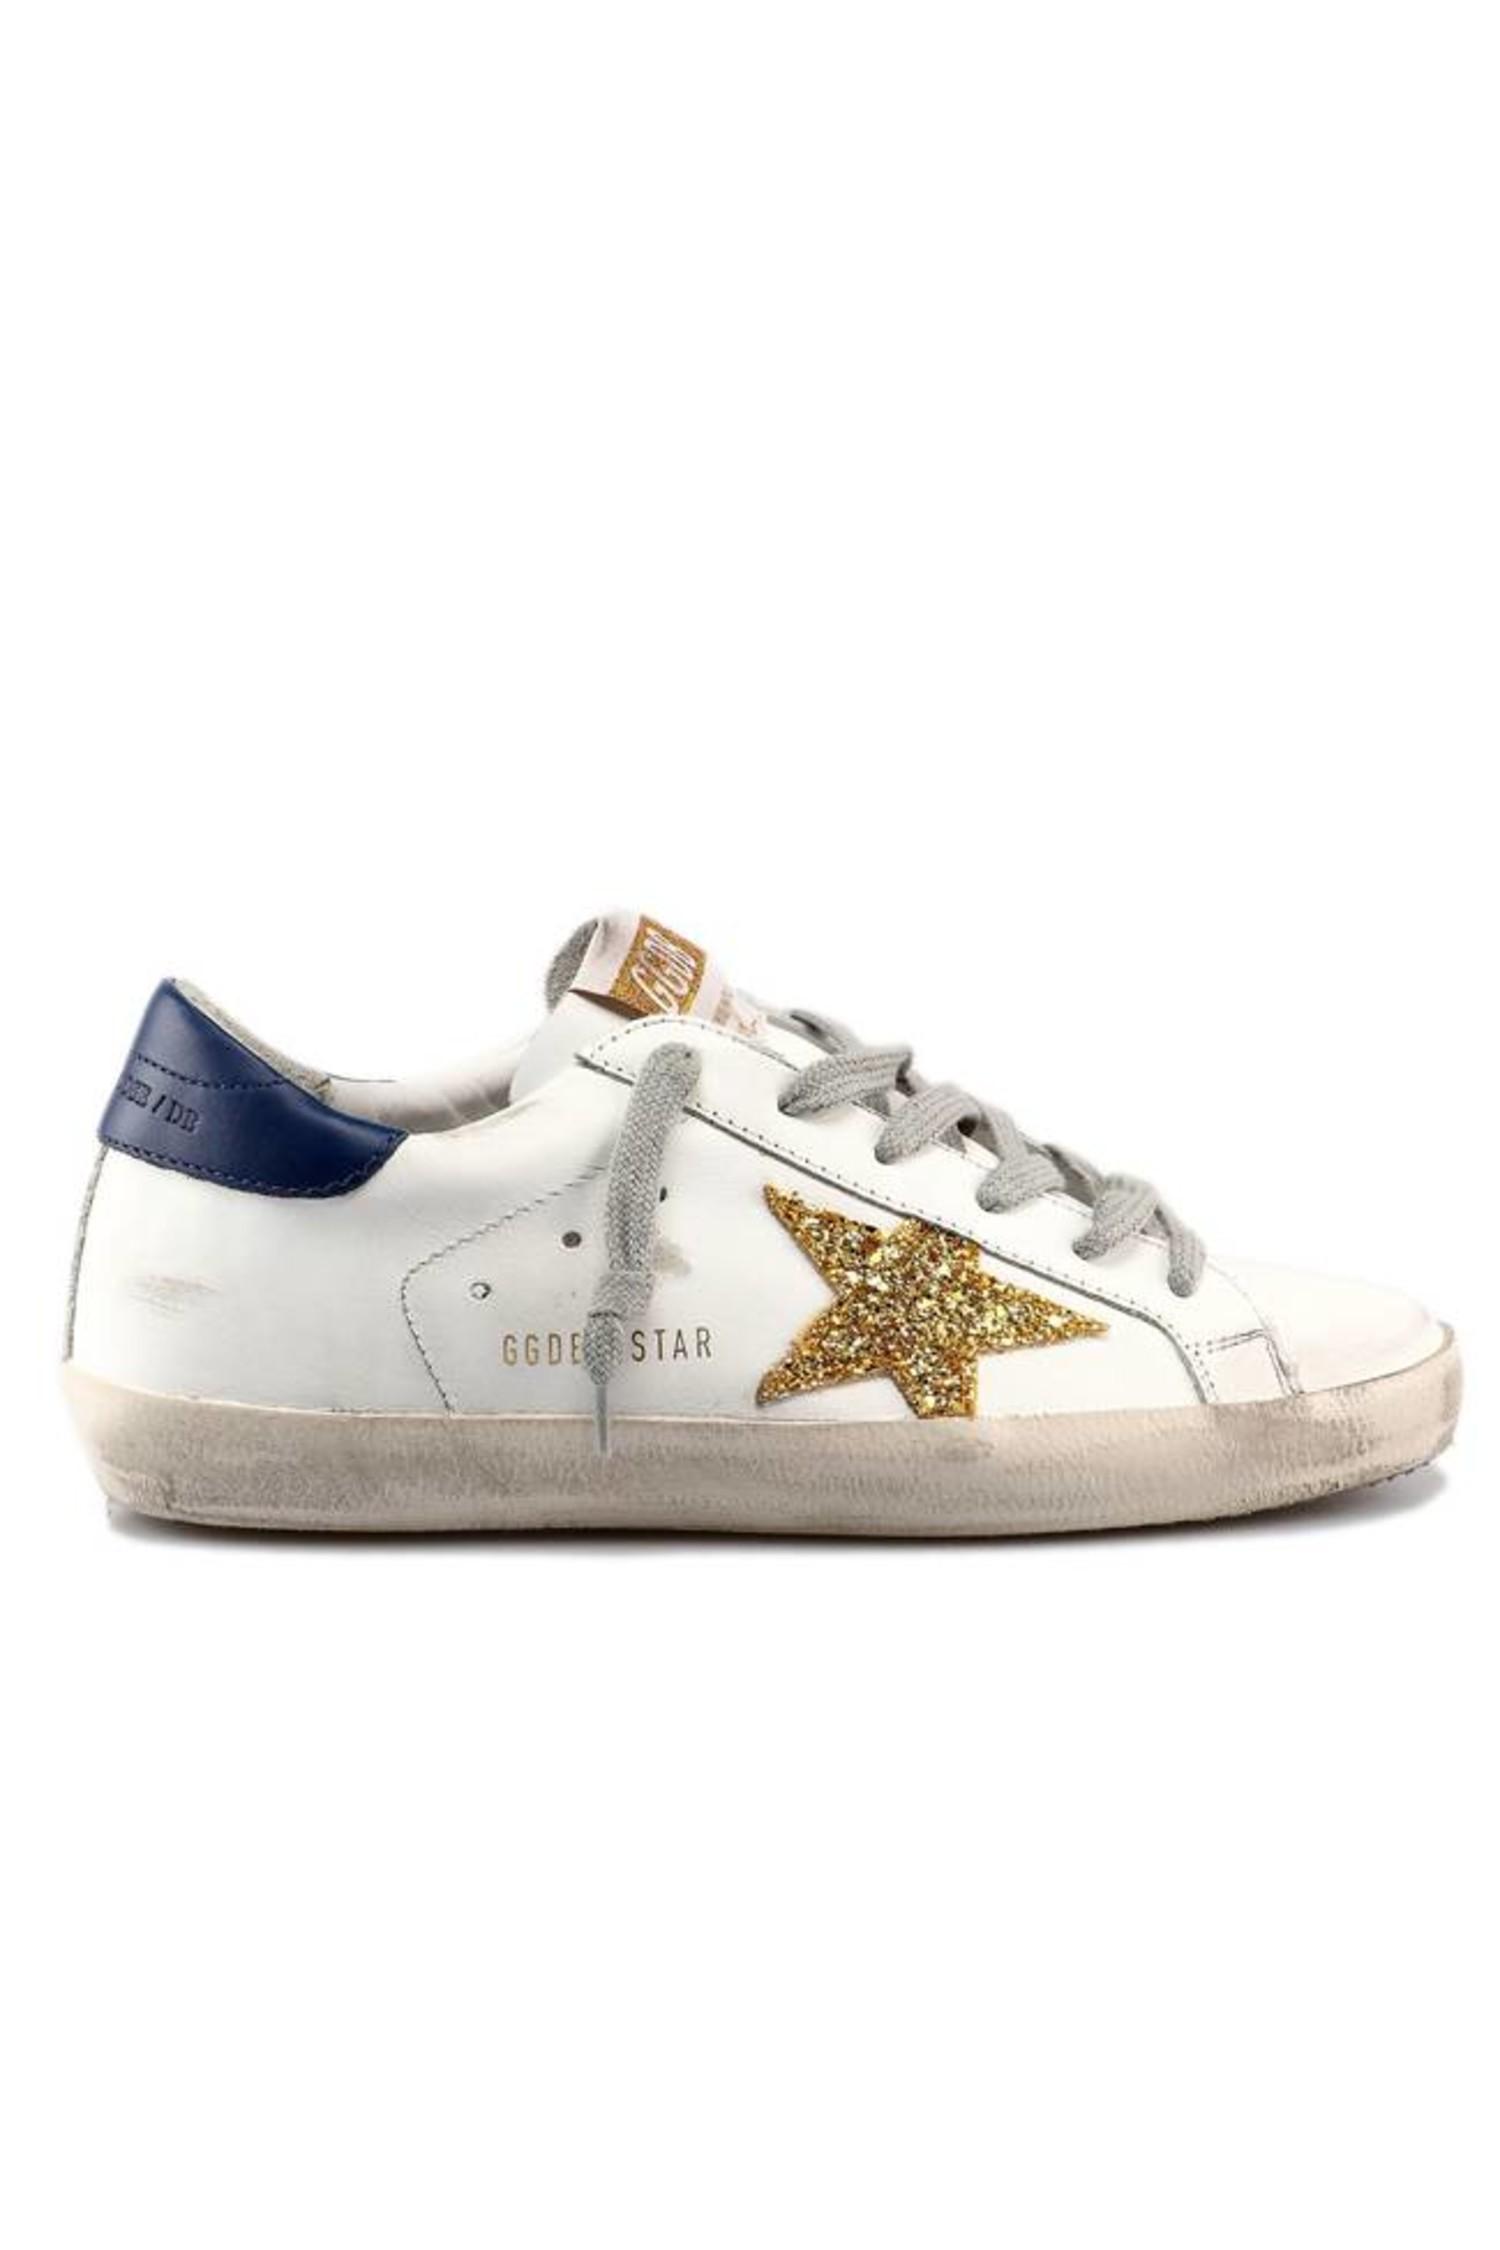 Golden Goose Sneakers Superstar - The Fold